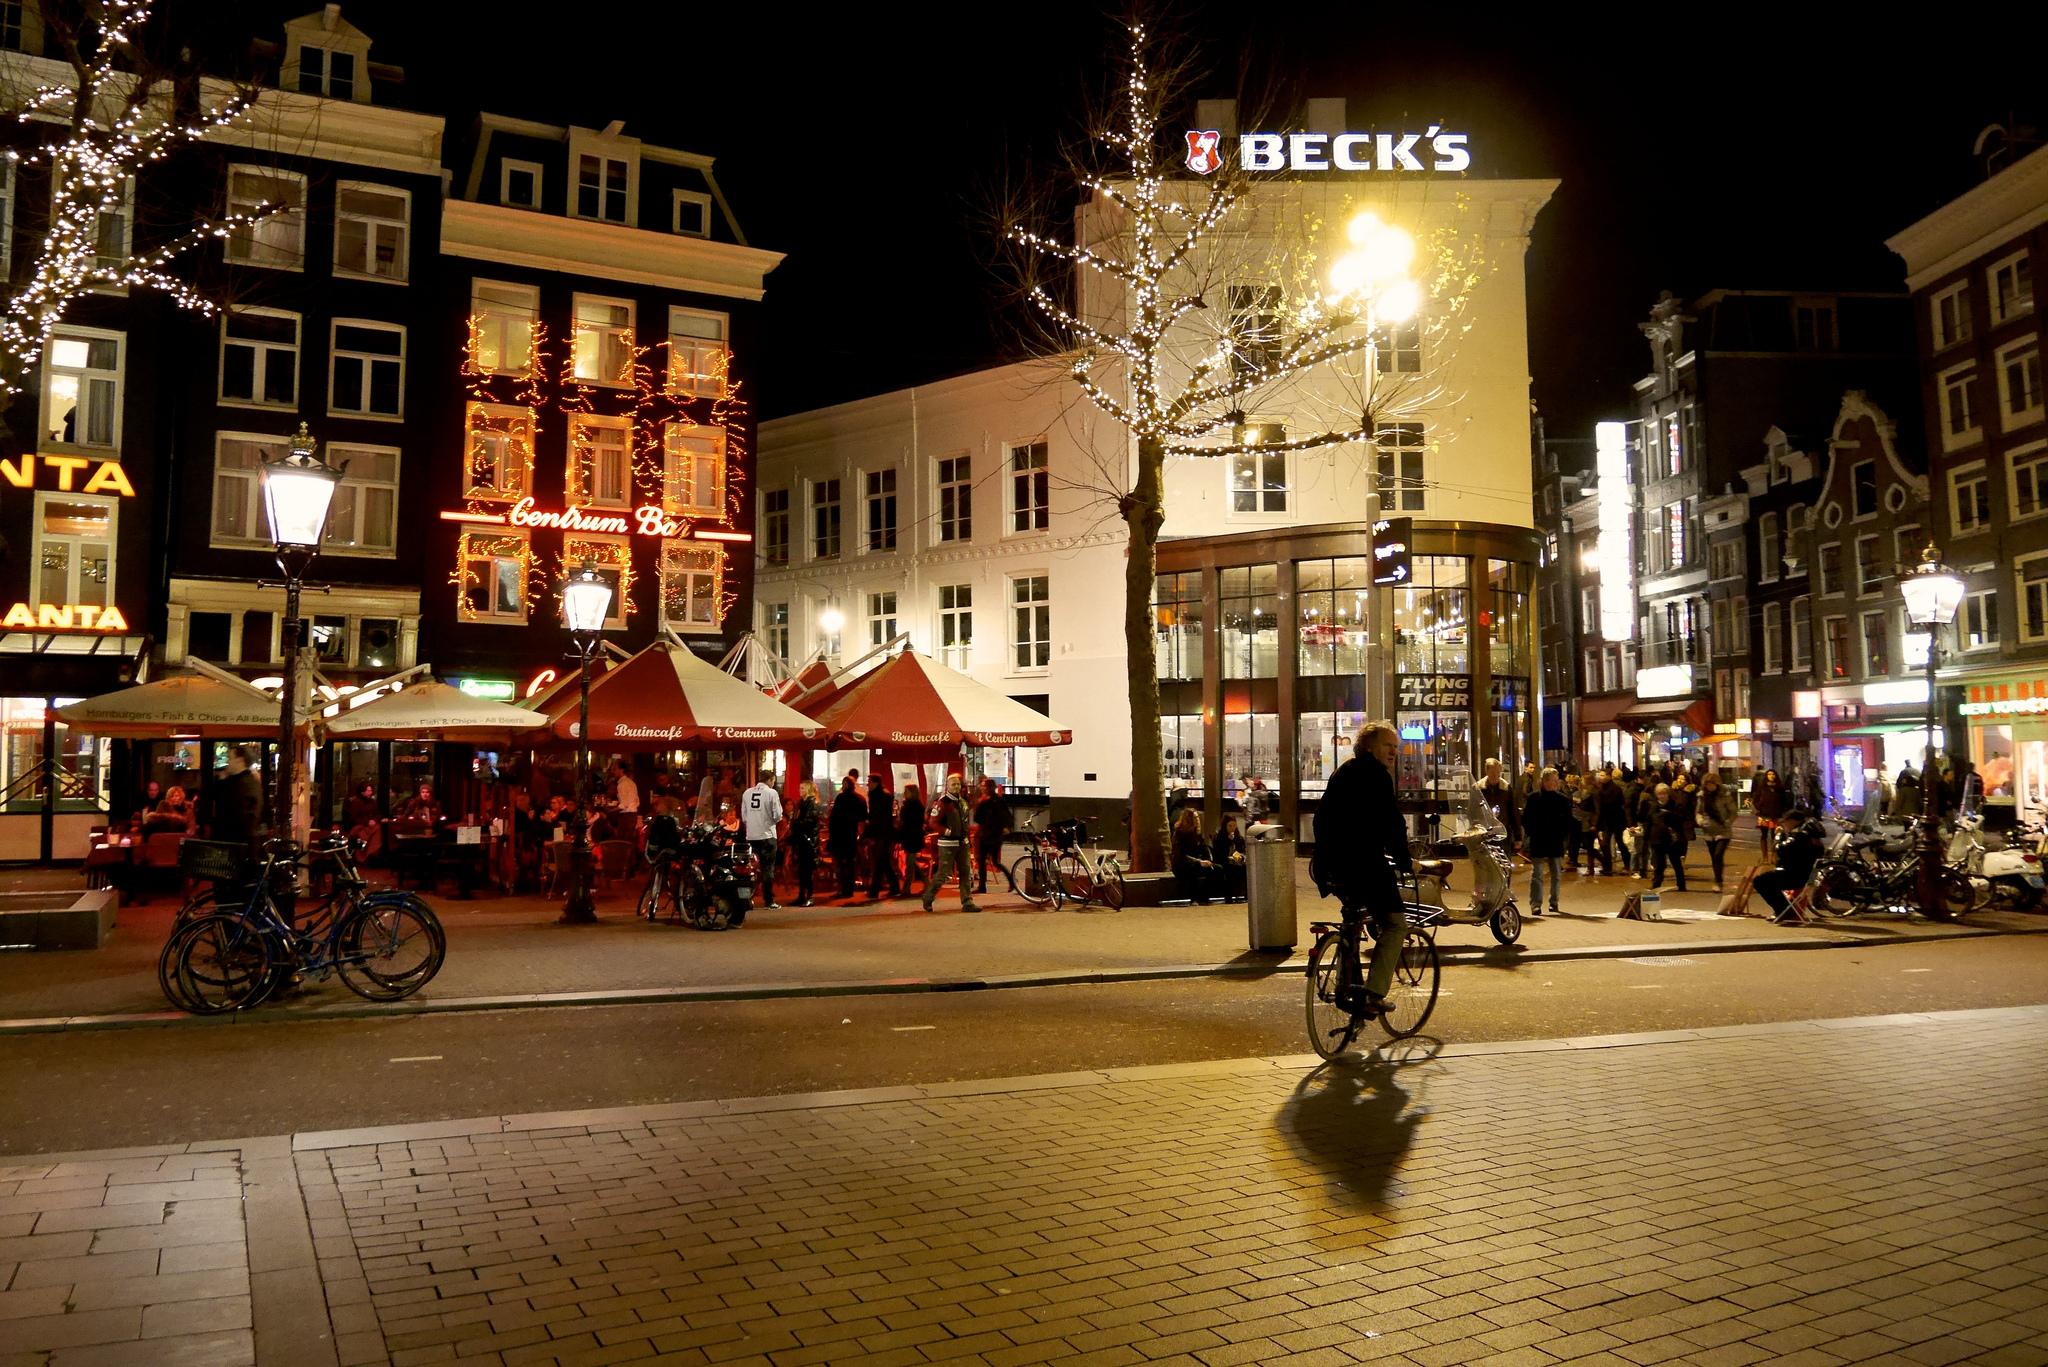 Площадь Рембрандта в Амстердаме, зима